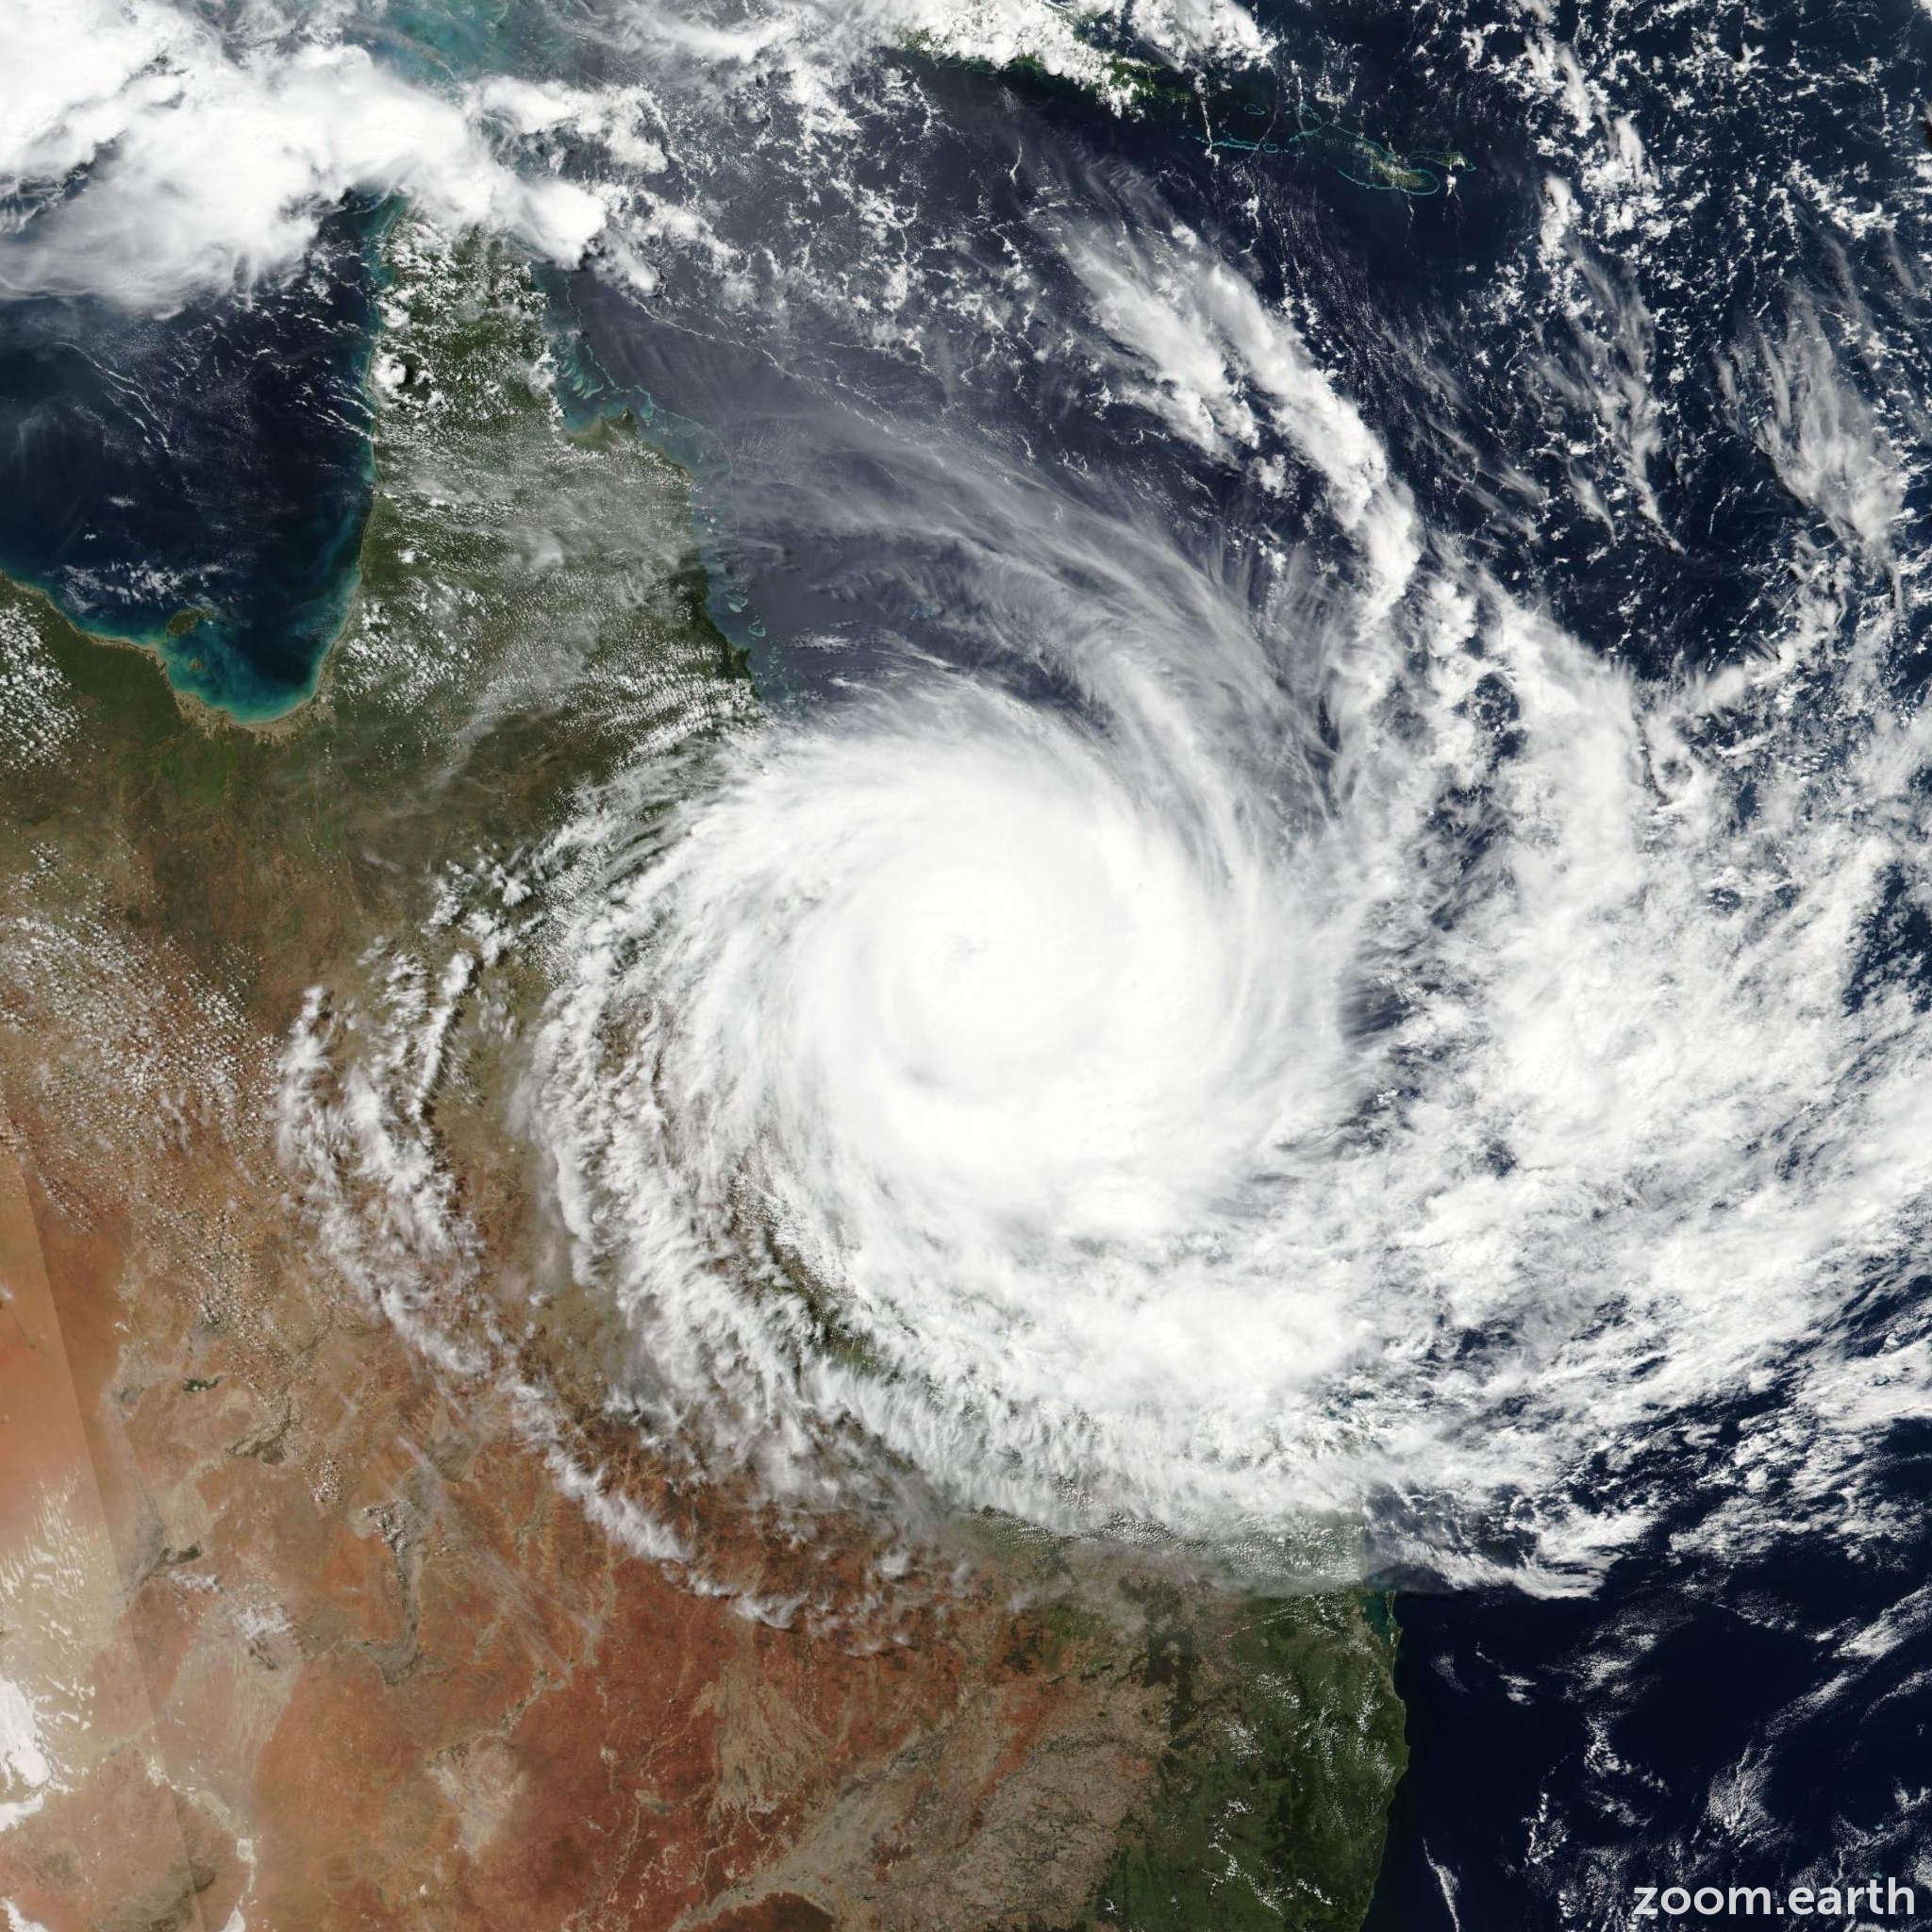 Satellite image of Cyclone Debbie 2017